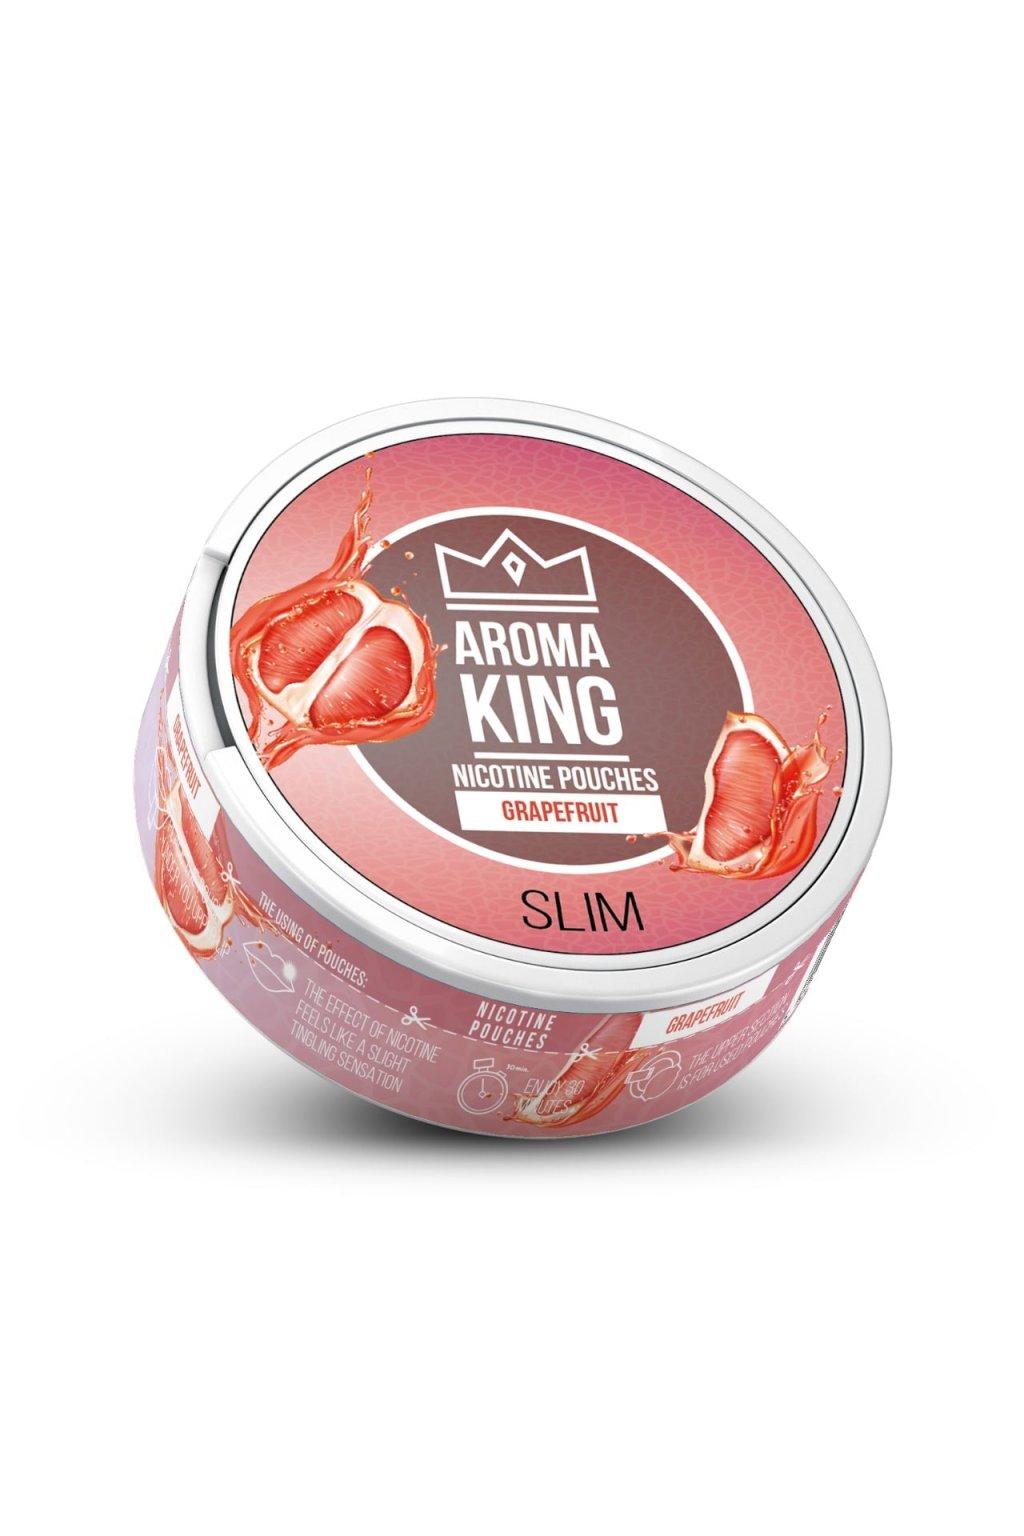 Aroma King nikotinove sacky Grapefruit nicopods